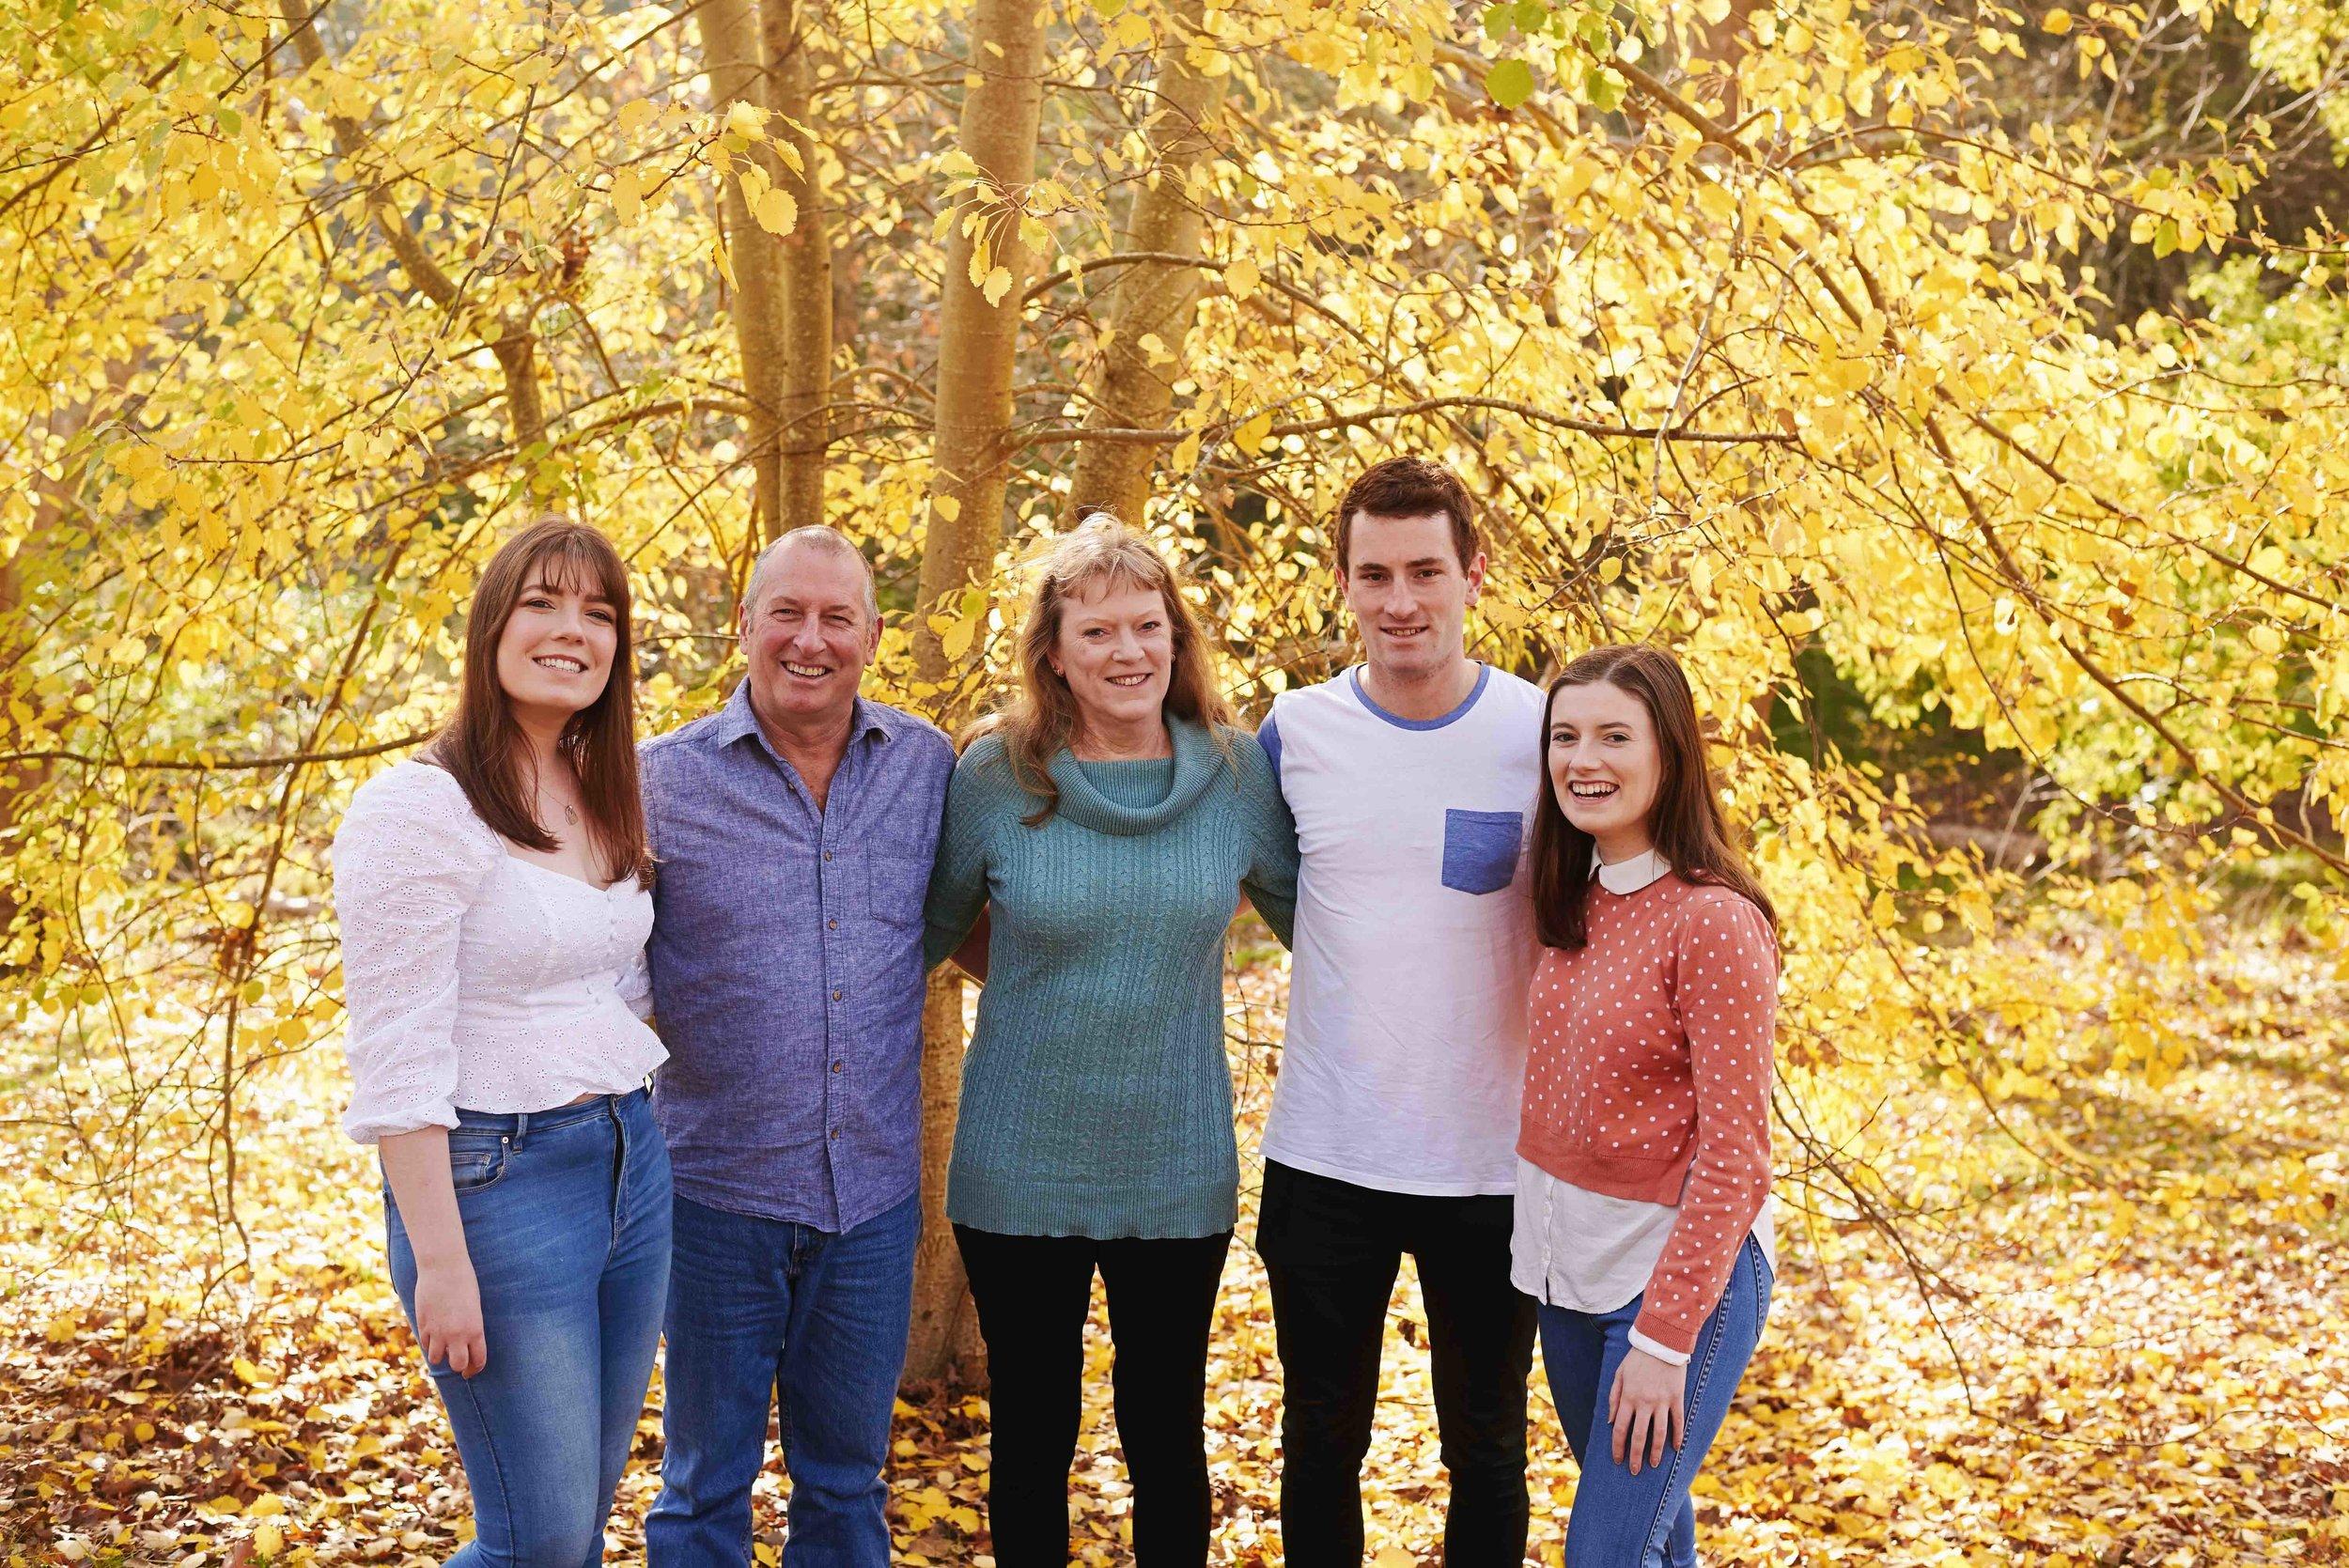 mornington-peninsula-family-photographer-marissa-jade-photography-families-red-hill-7.jpg